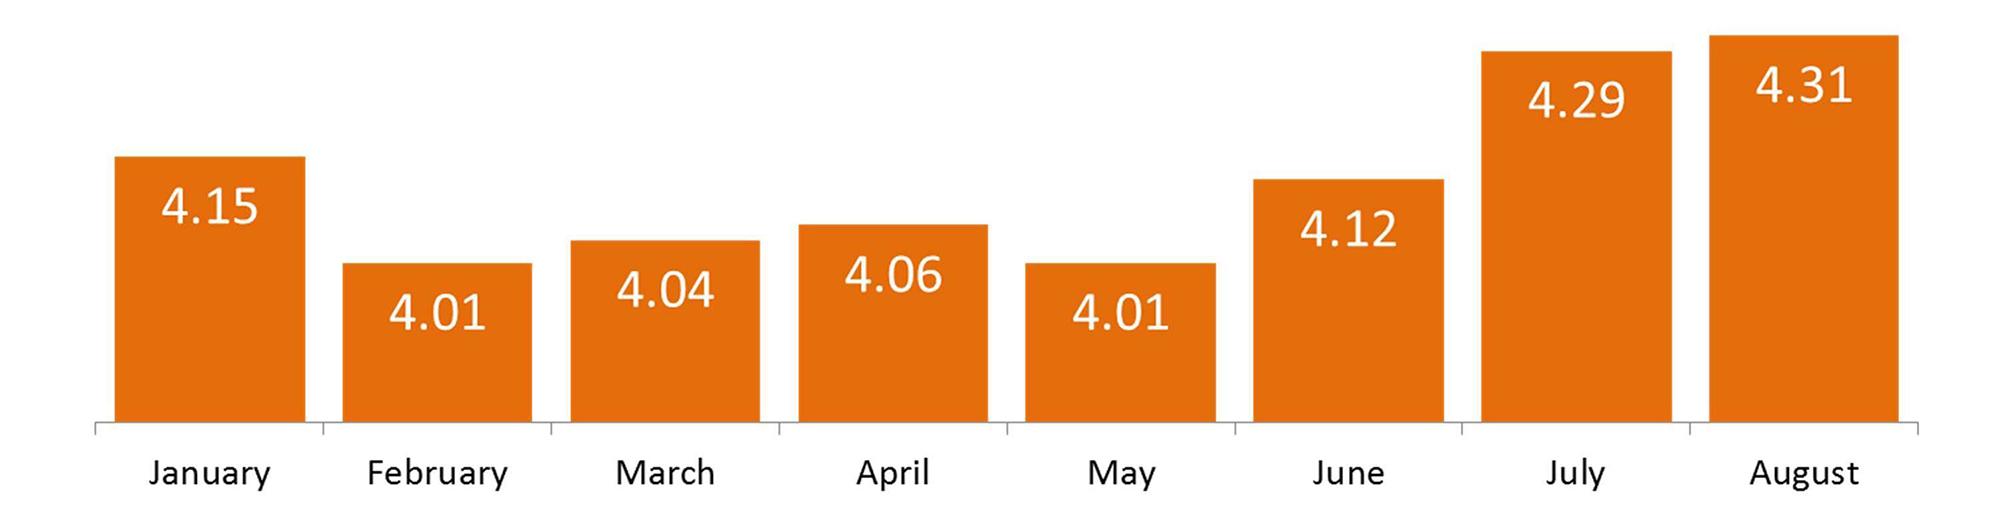 Ellie Mae Interest Rates | Simplifying The Market